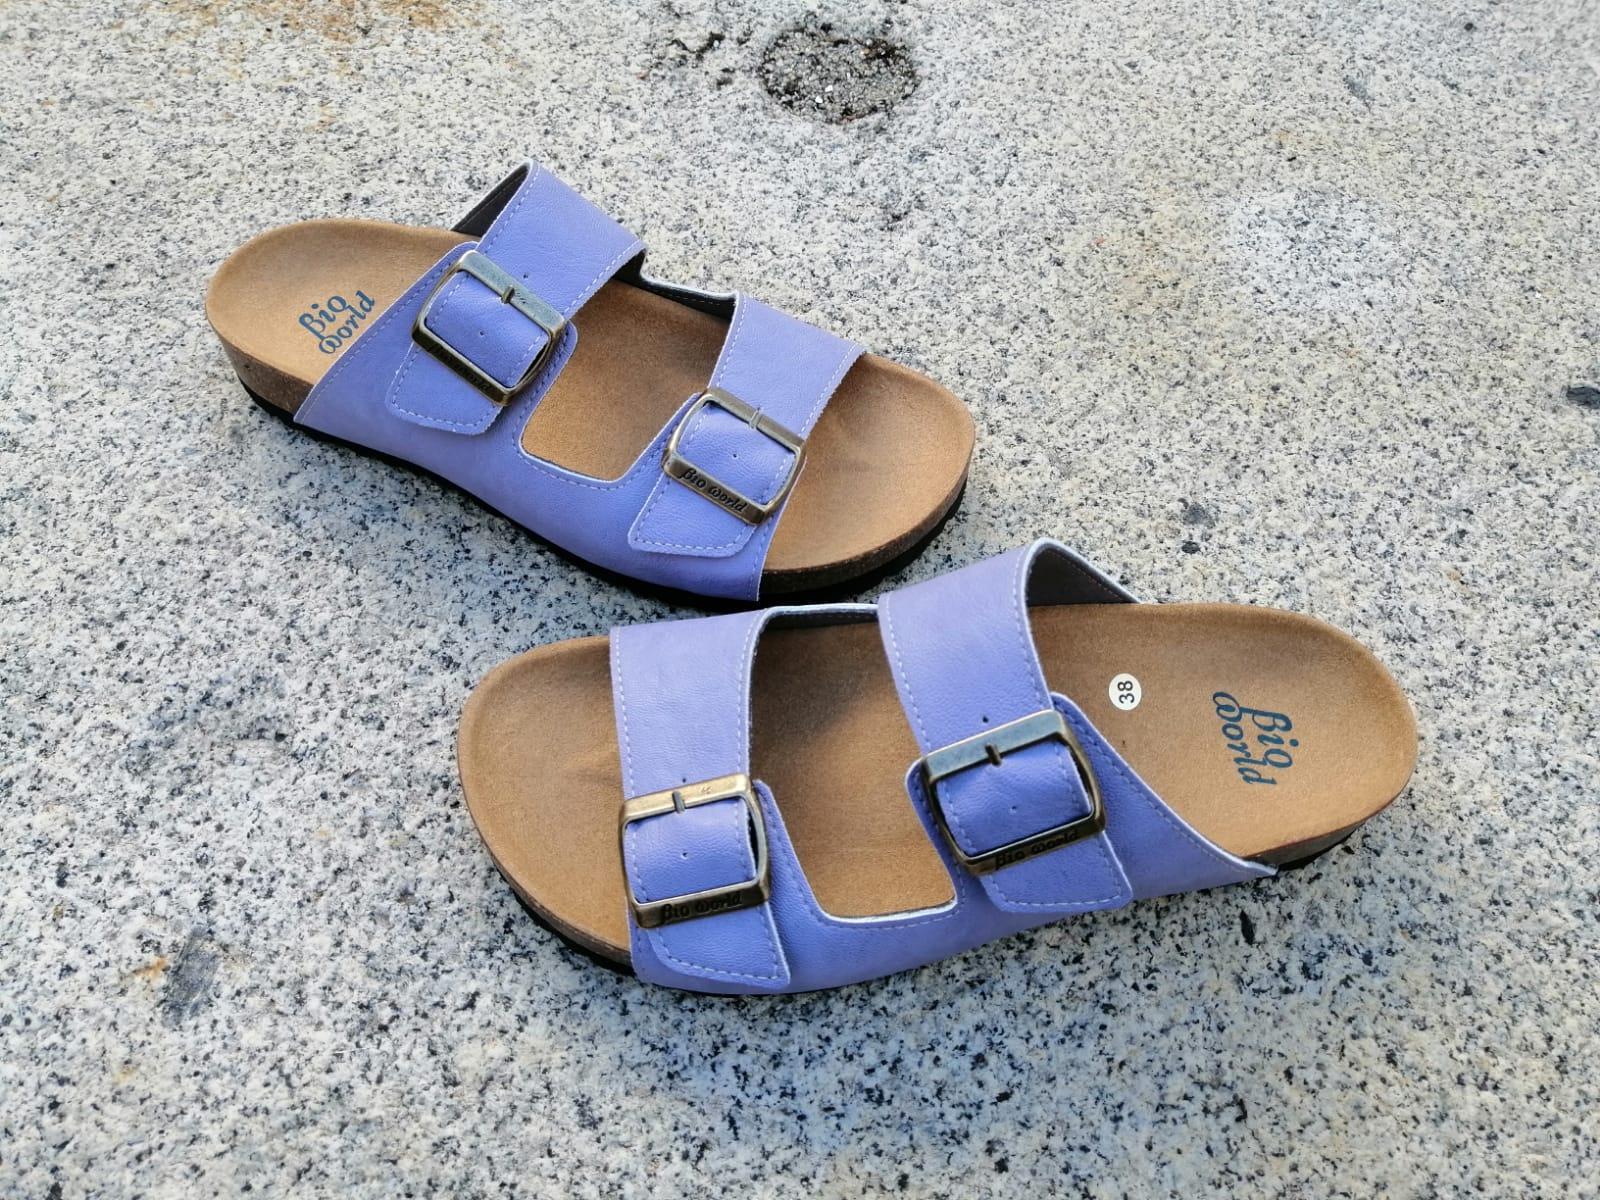 Victoria lila, edición limitada  sandalias veganas, sandalias veganas mujer, calzado vegano, sandalias de tacón bajo, sandalias bioworld, vegan shoes.